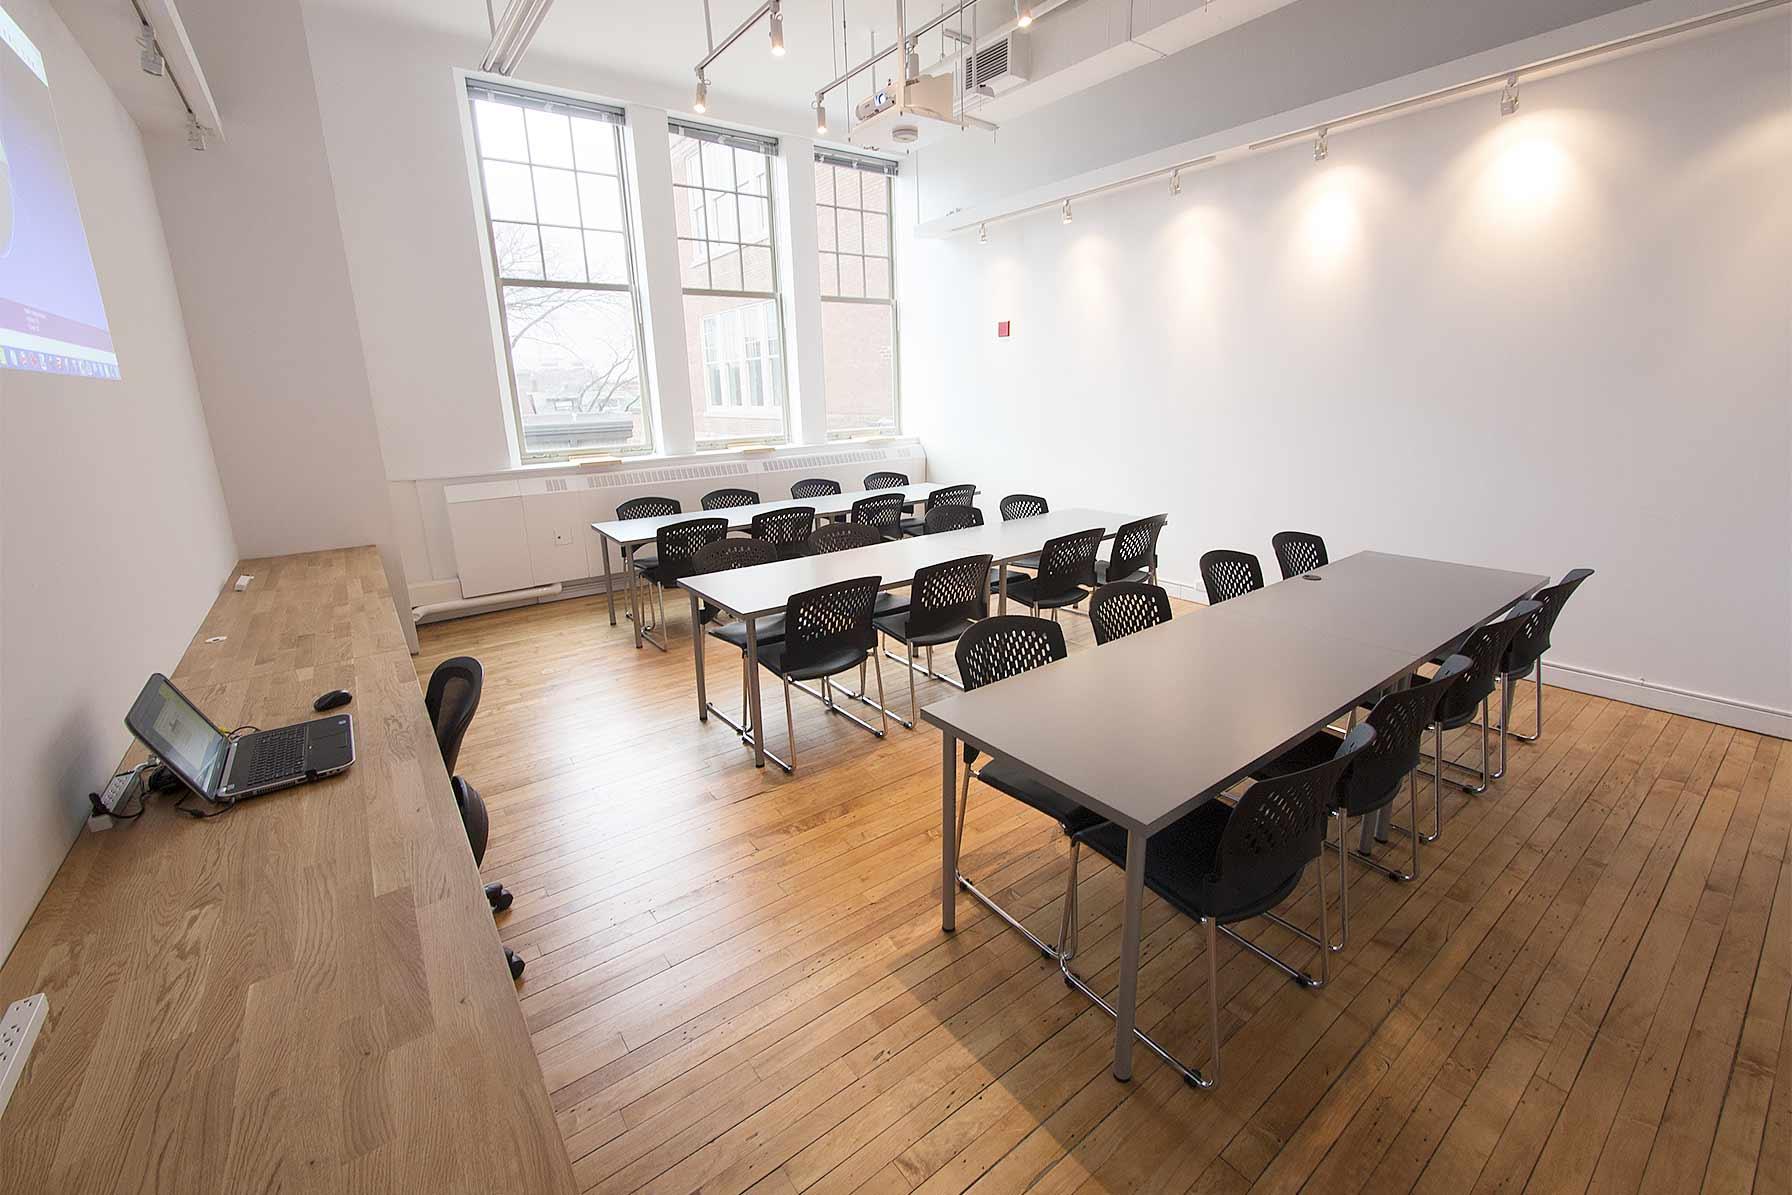 3 delta studio classroom configuration